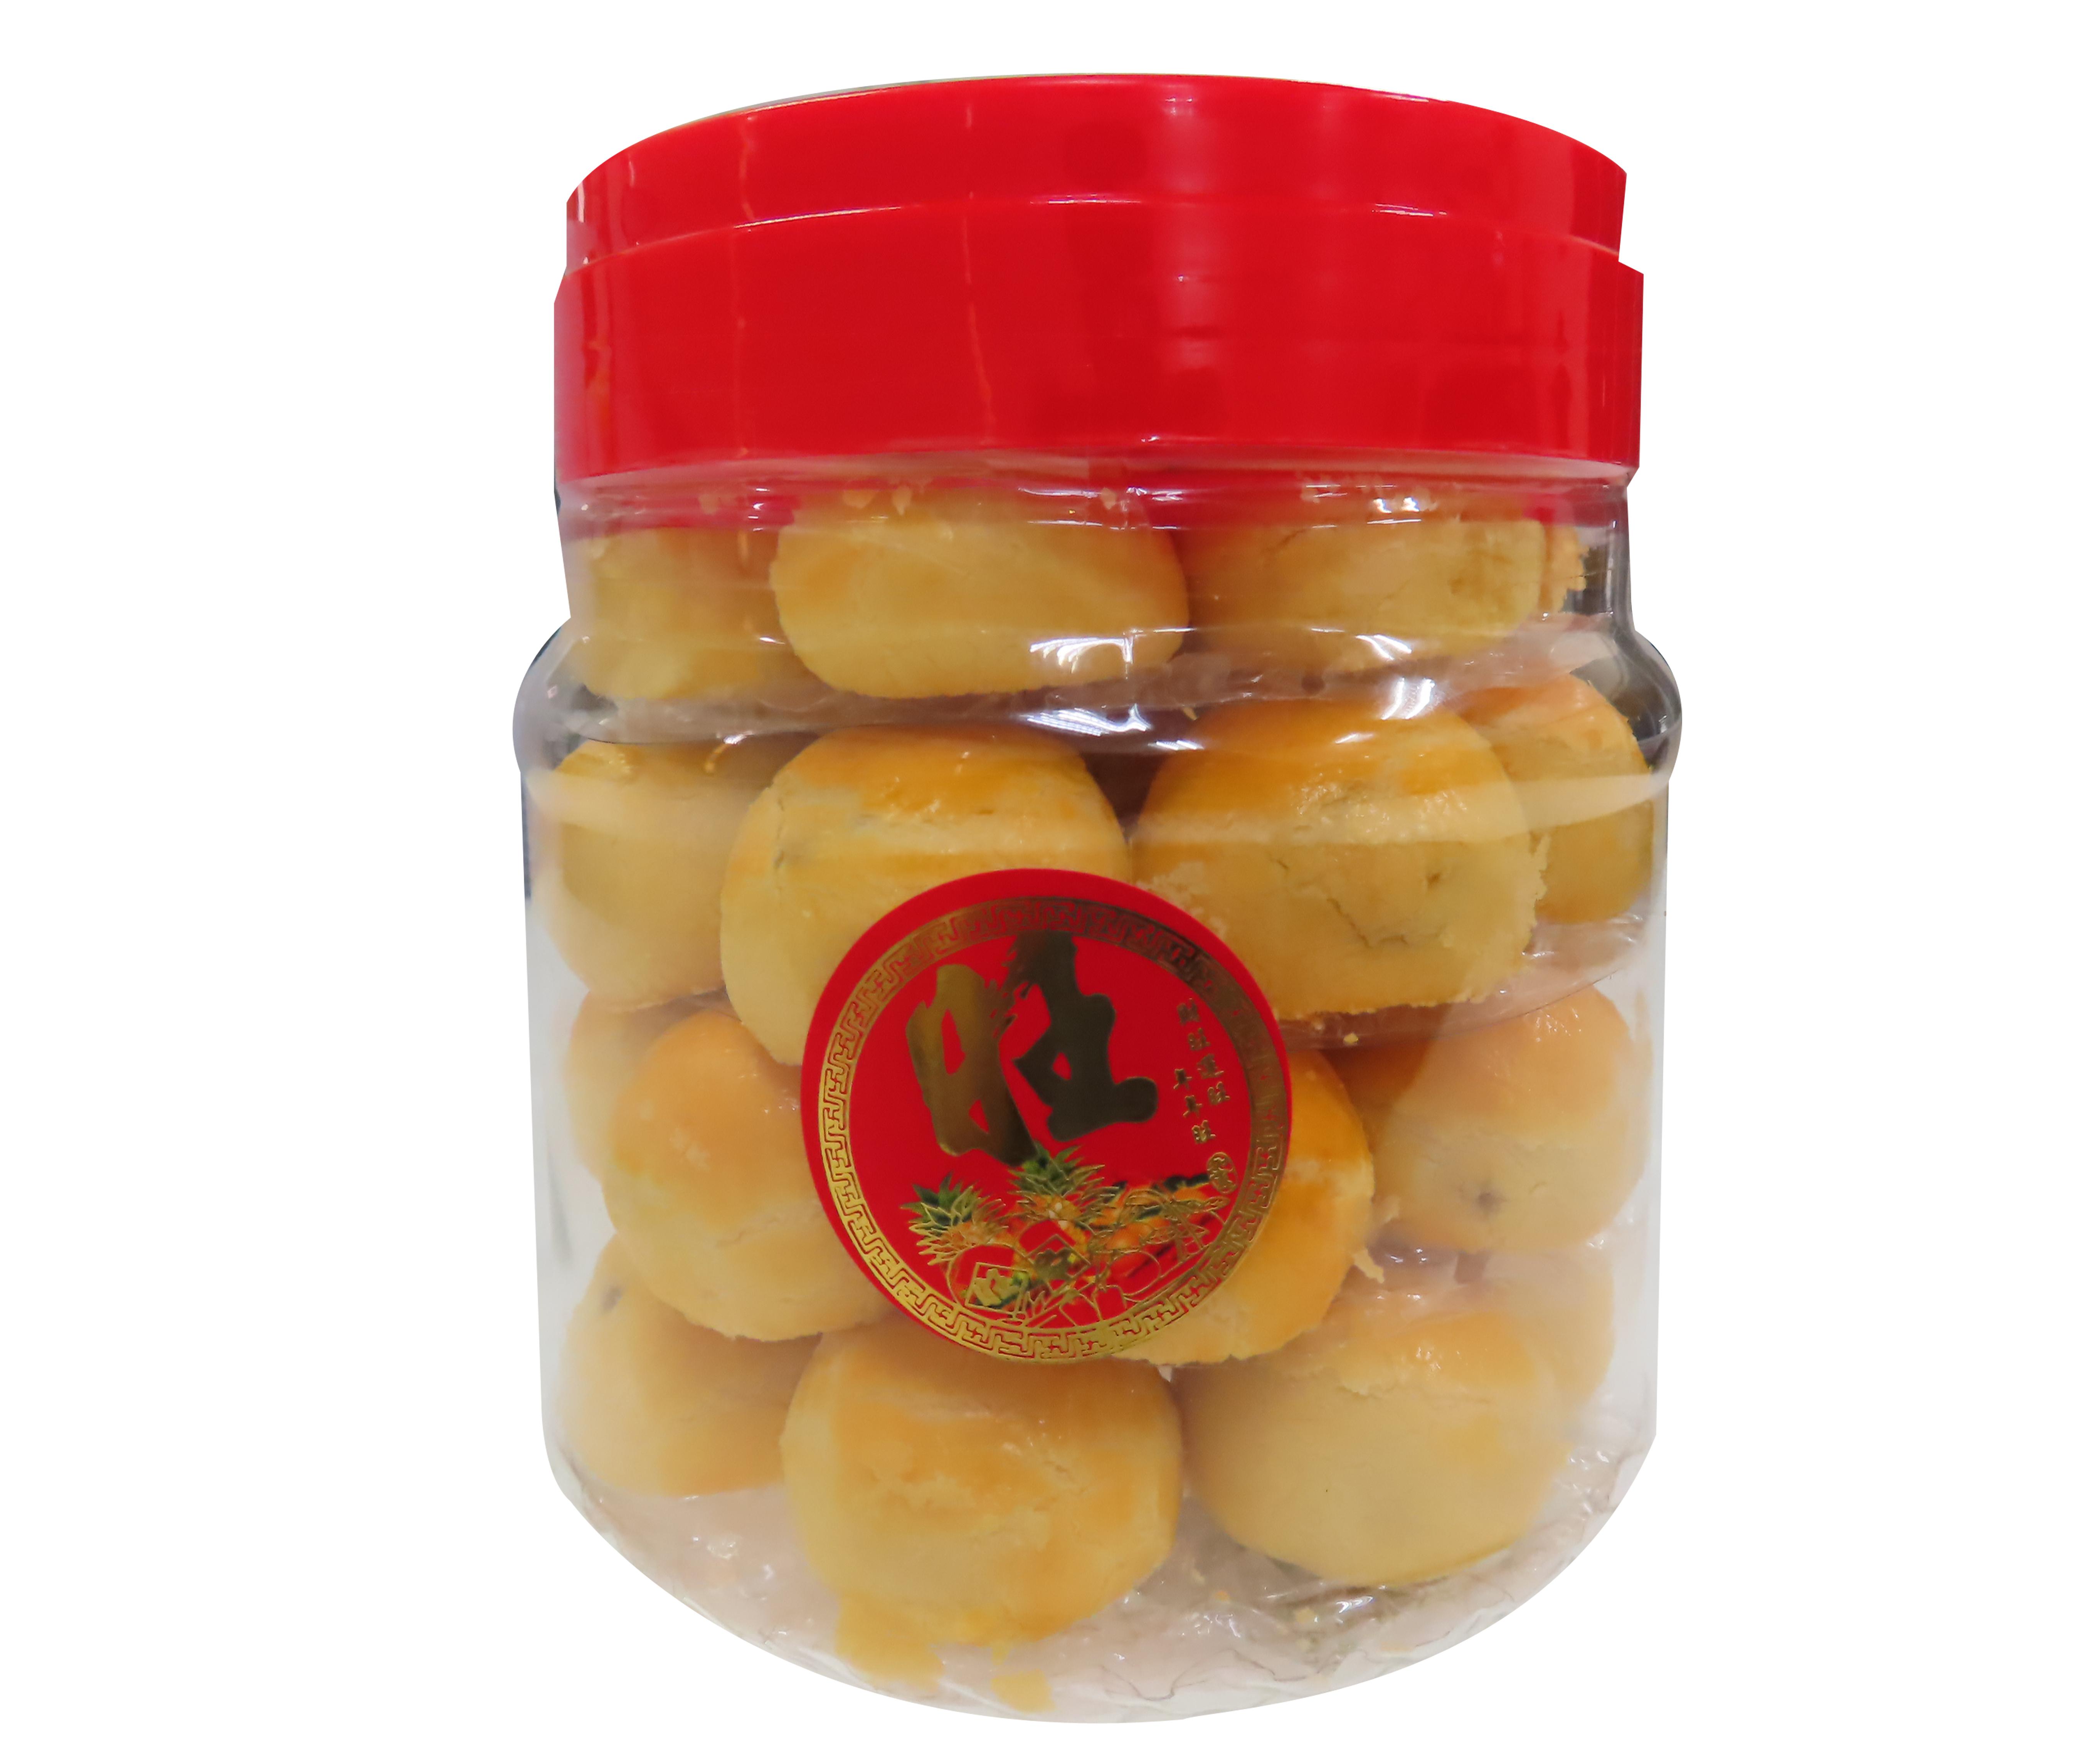 Image Butter Pineapple Ball A88 善缘 - 奶油凤梨球 (蛋素) 350grams